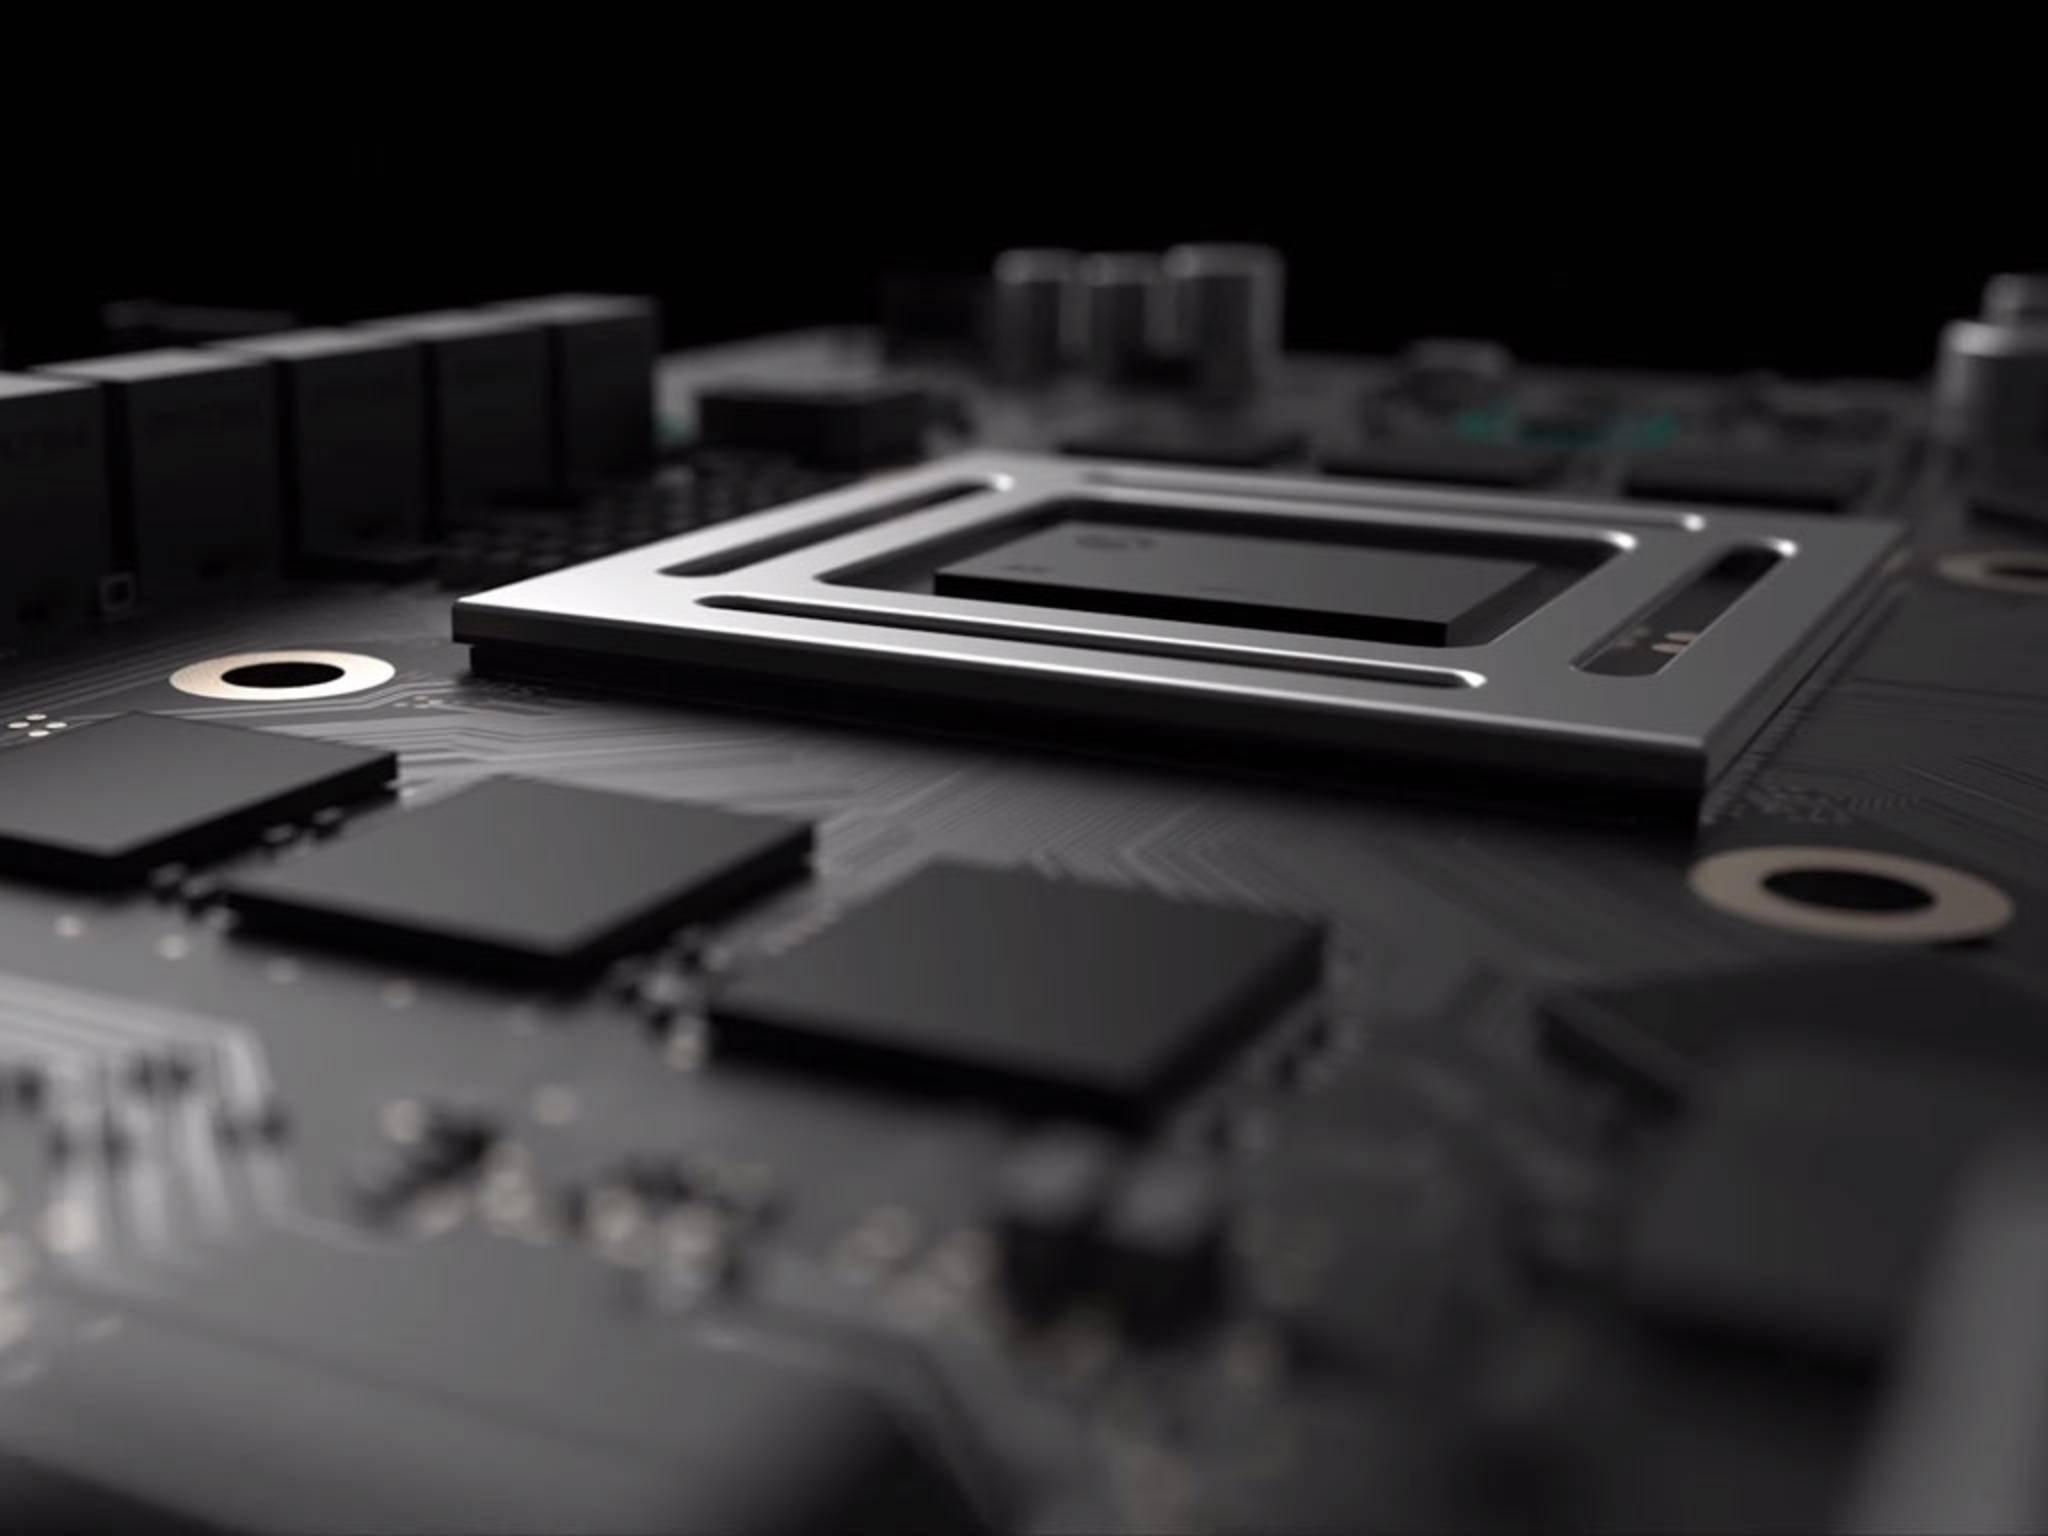 Project Scorpio schafft 6 Teraflops, doch 4K-Gaming in 60 fps ist kaum denkbar.